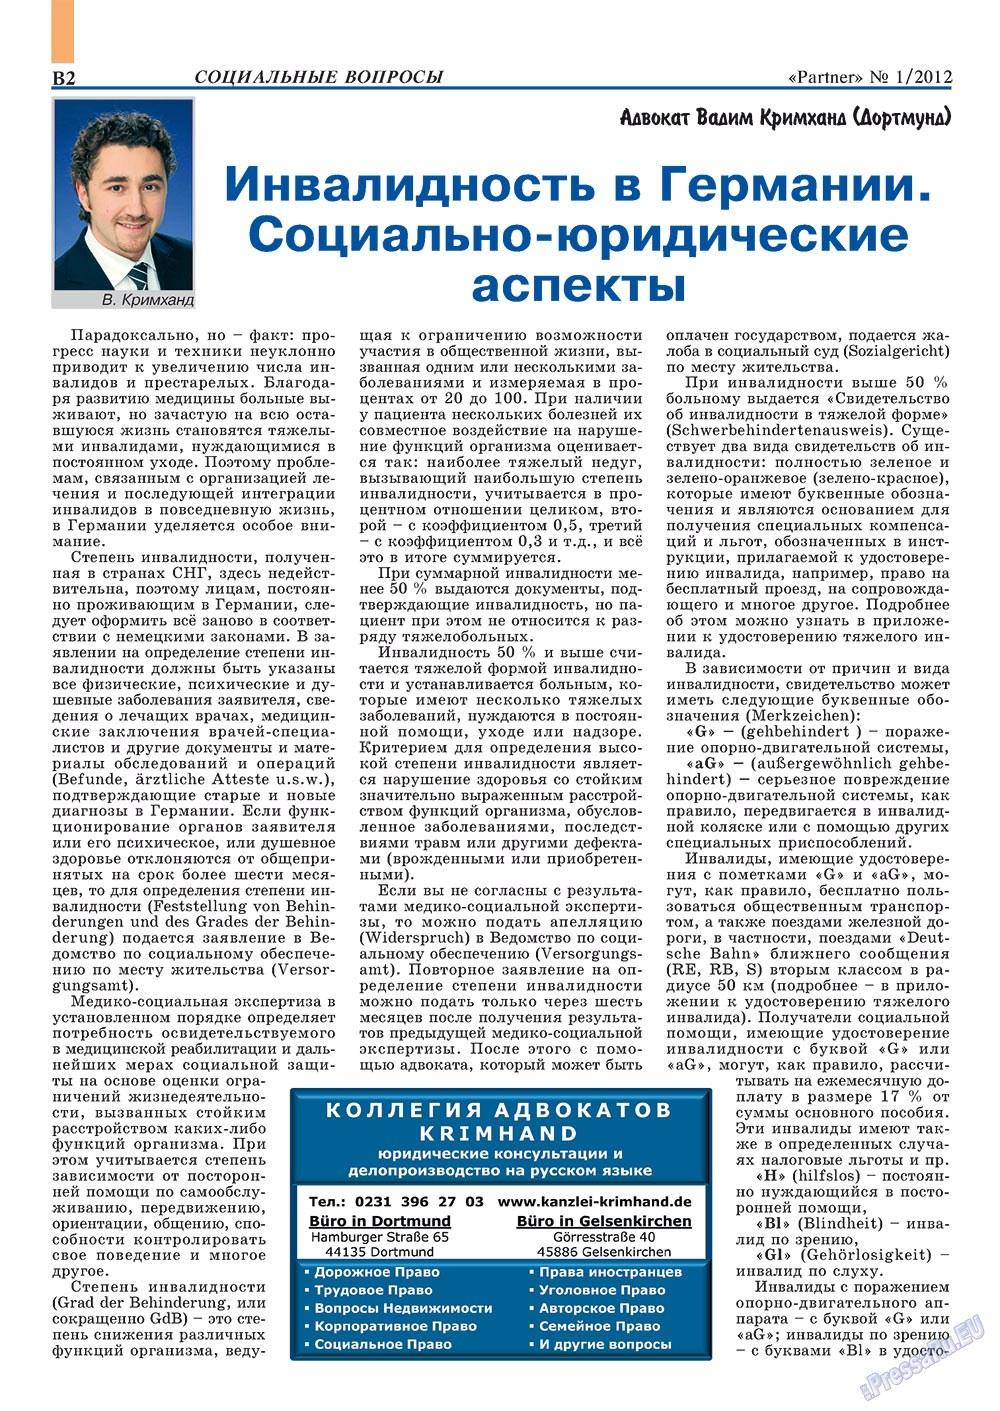 Партнер-север (журнал). 2012 год, номер 1, стр. 12